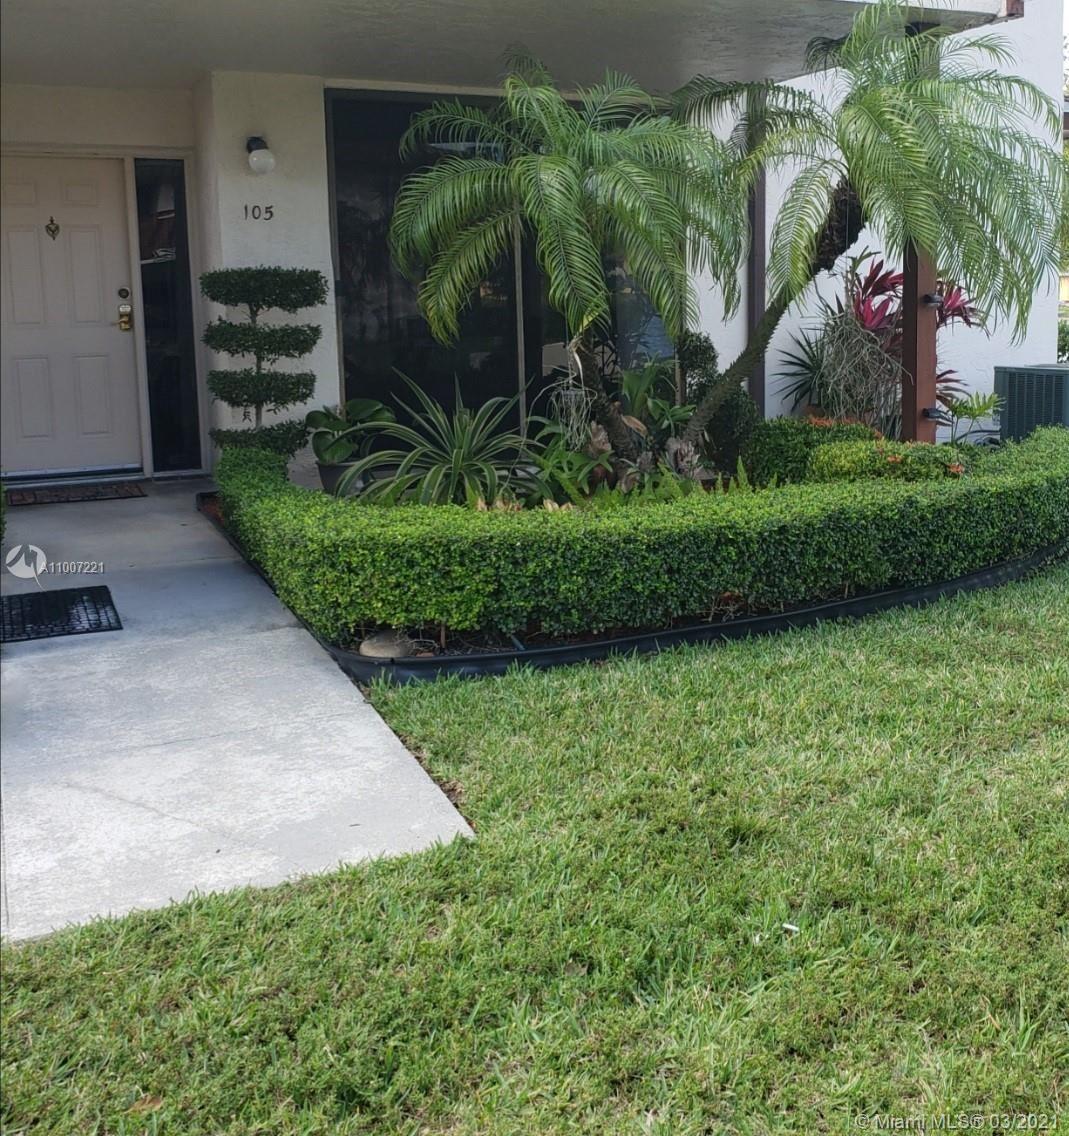 615 NW 210th St #105-25, Miami Gardens, FL 33169 - #: A11007221